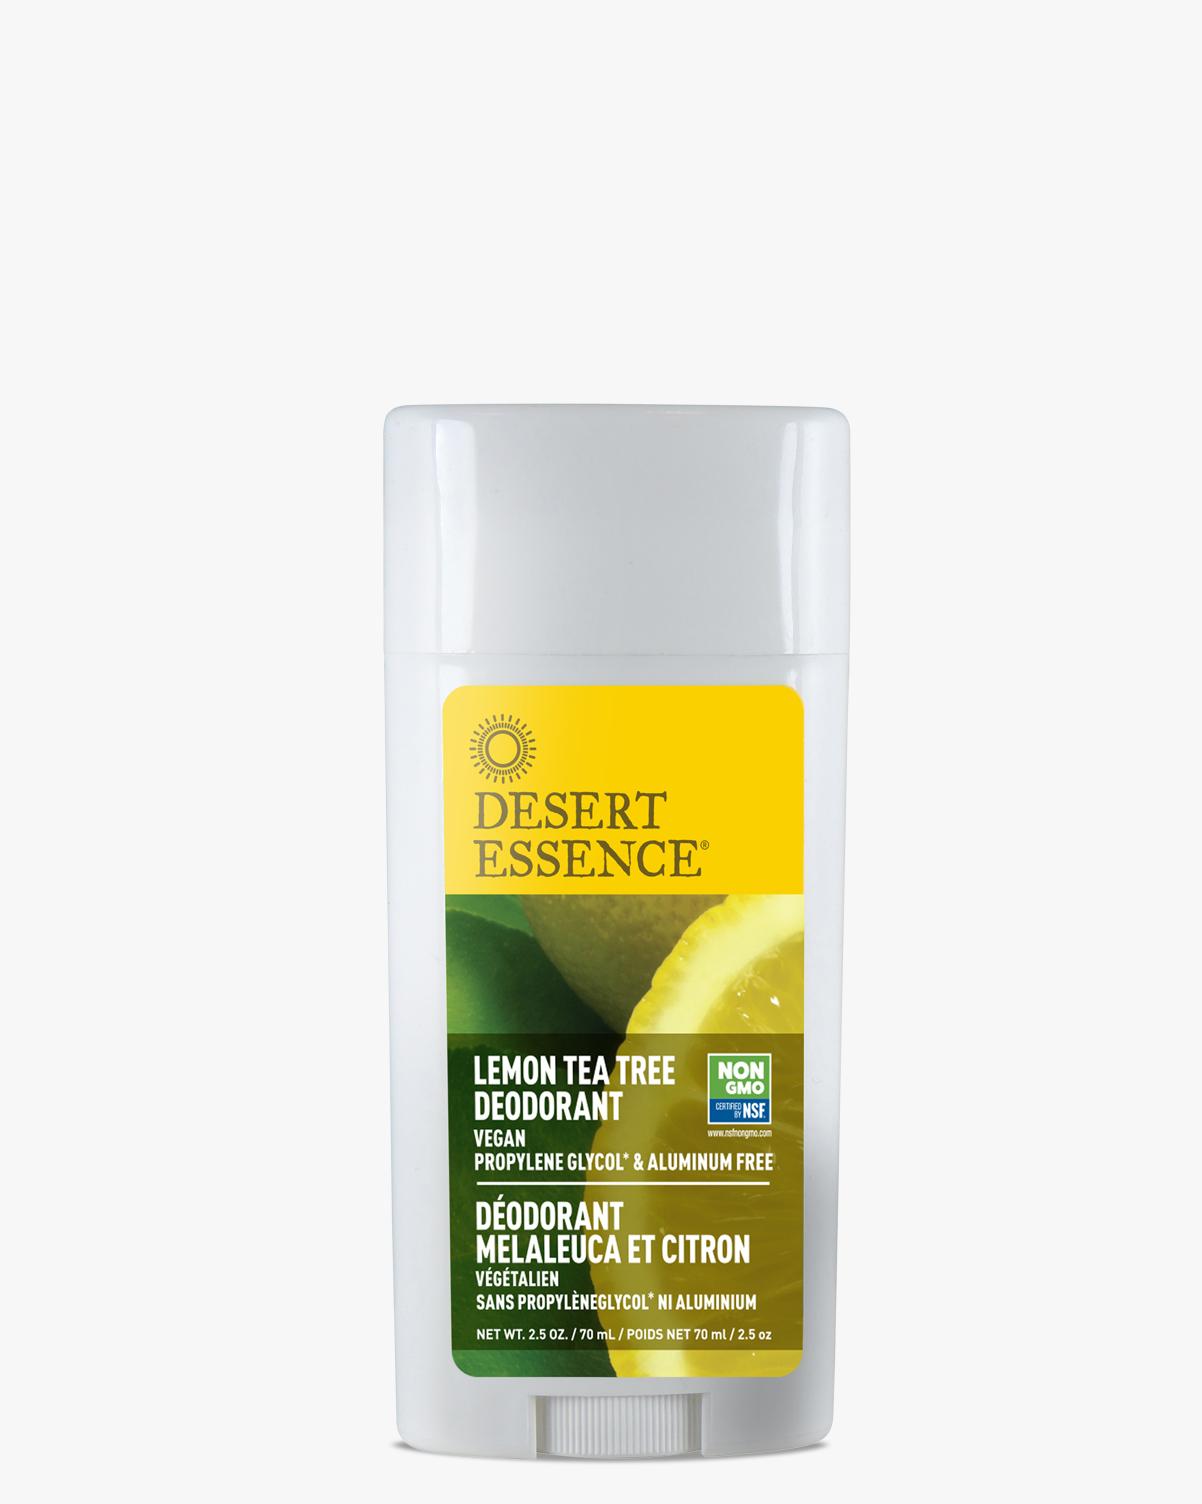 Desert Essence coupon: Desert Essence Lemon Tea Tree Deodorant, 2.5 oz. | Vegan | Gluten-Free